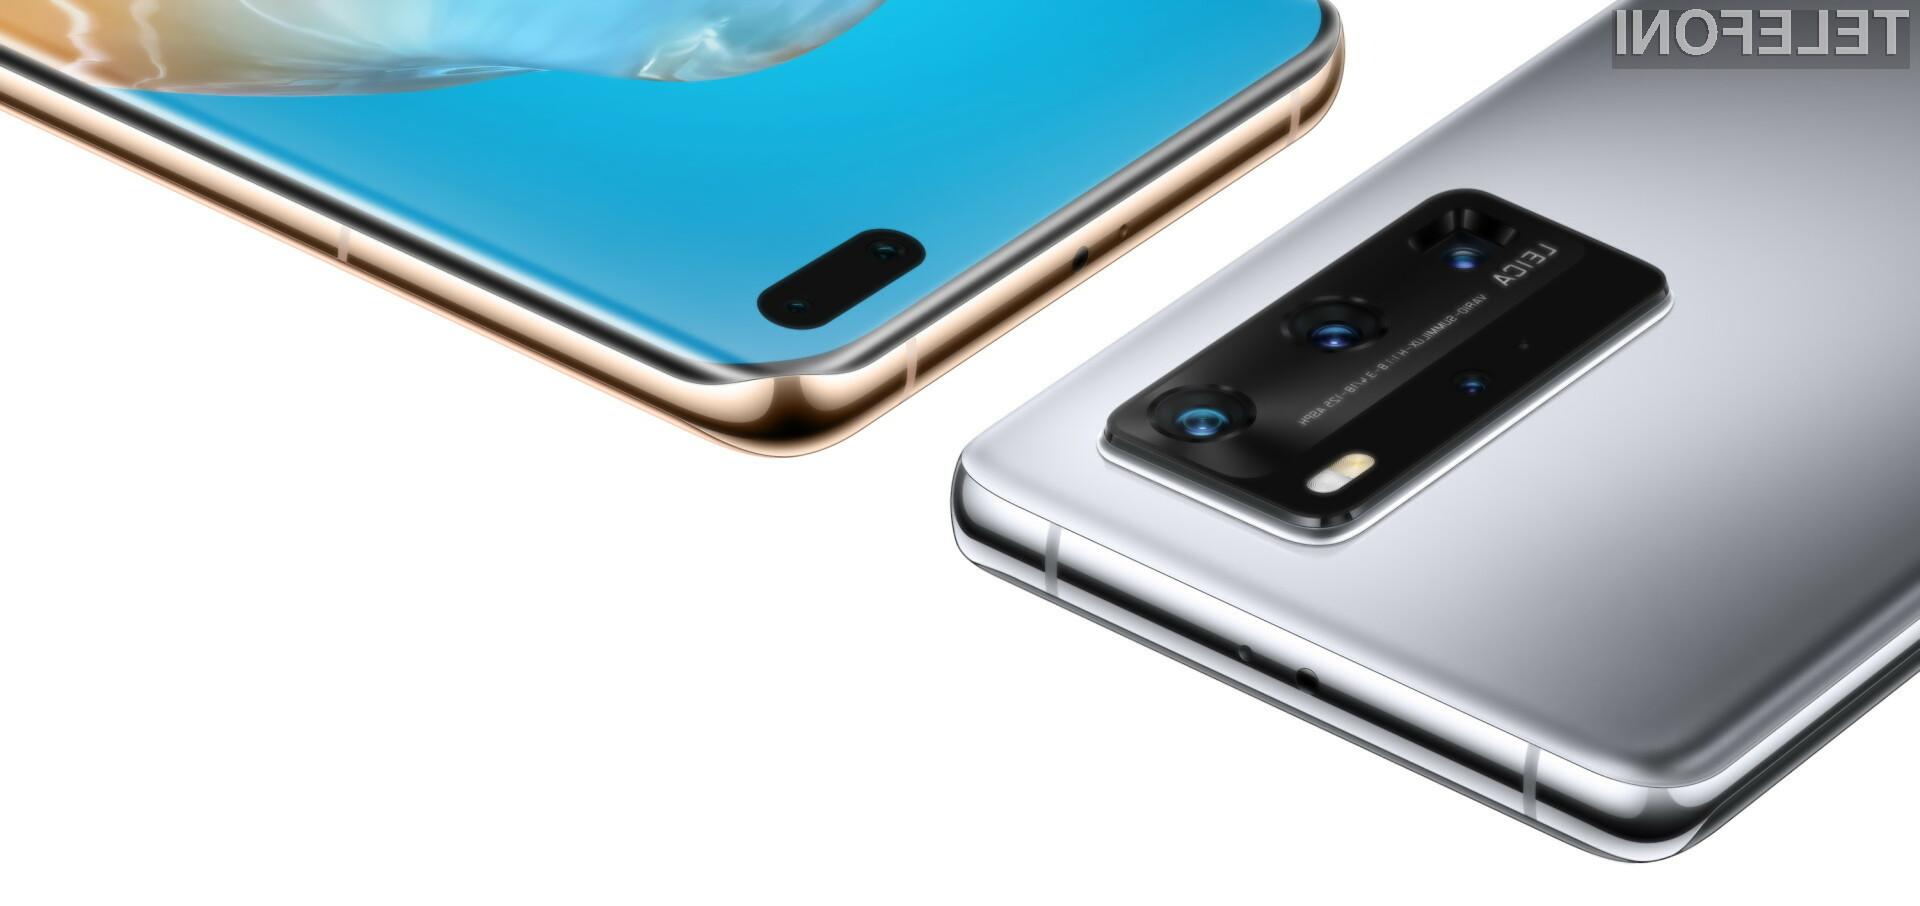 Huawei P40 je brez dvoma vrhunski telefon.